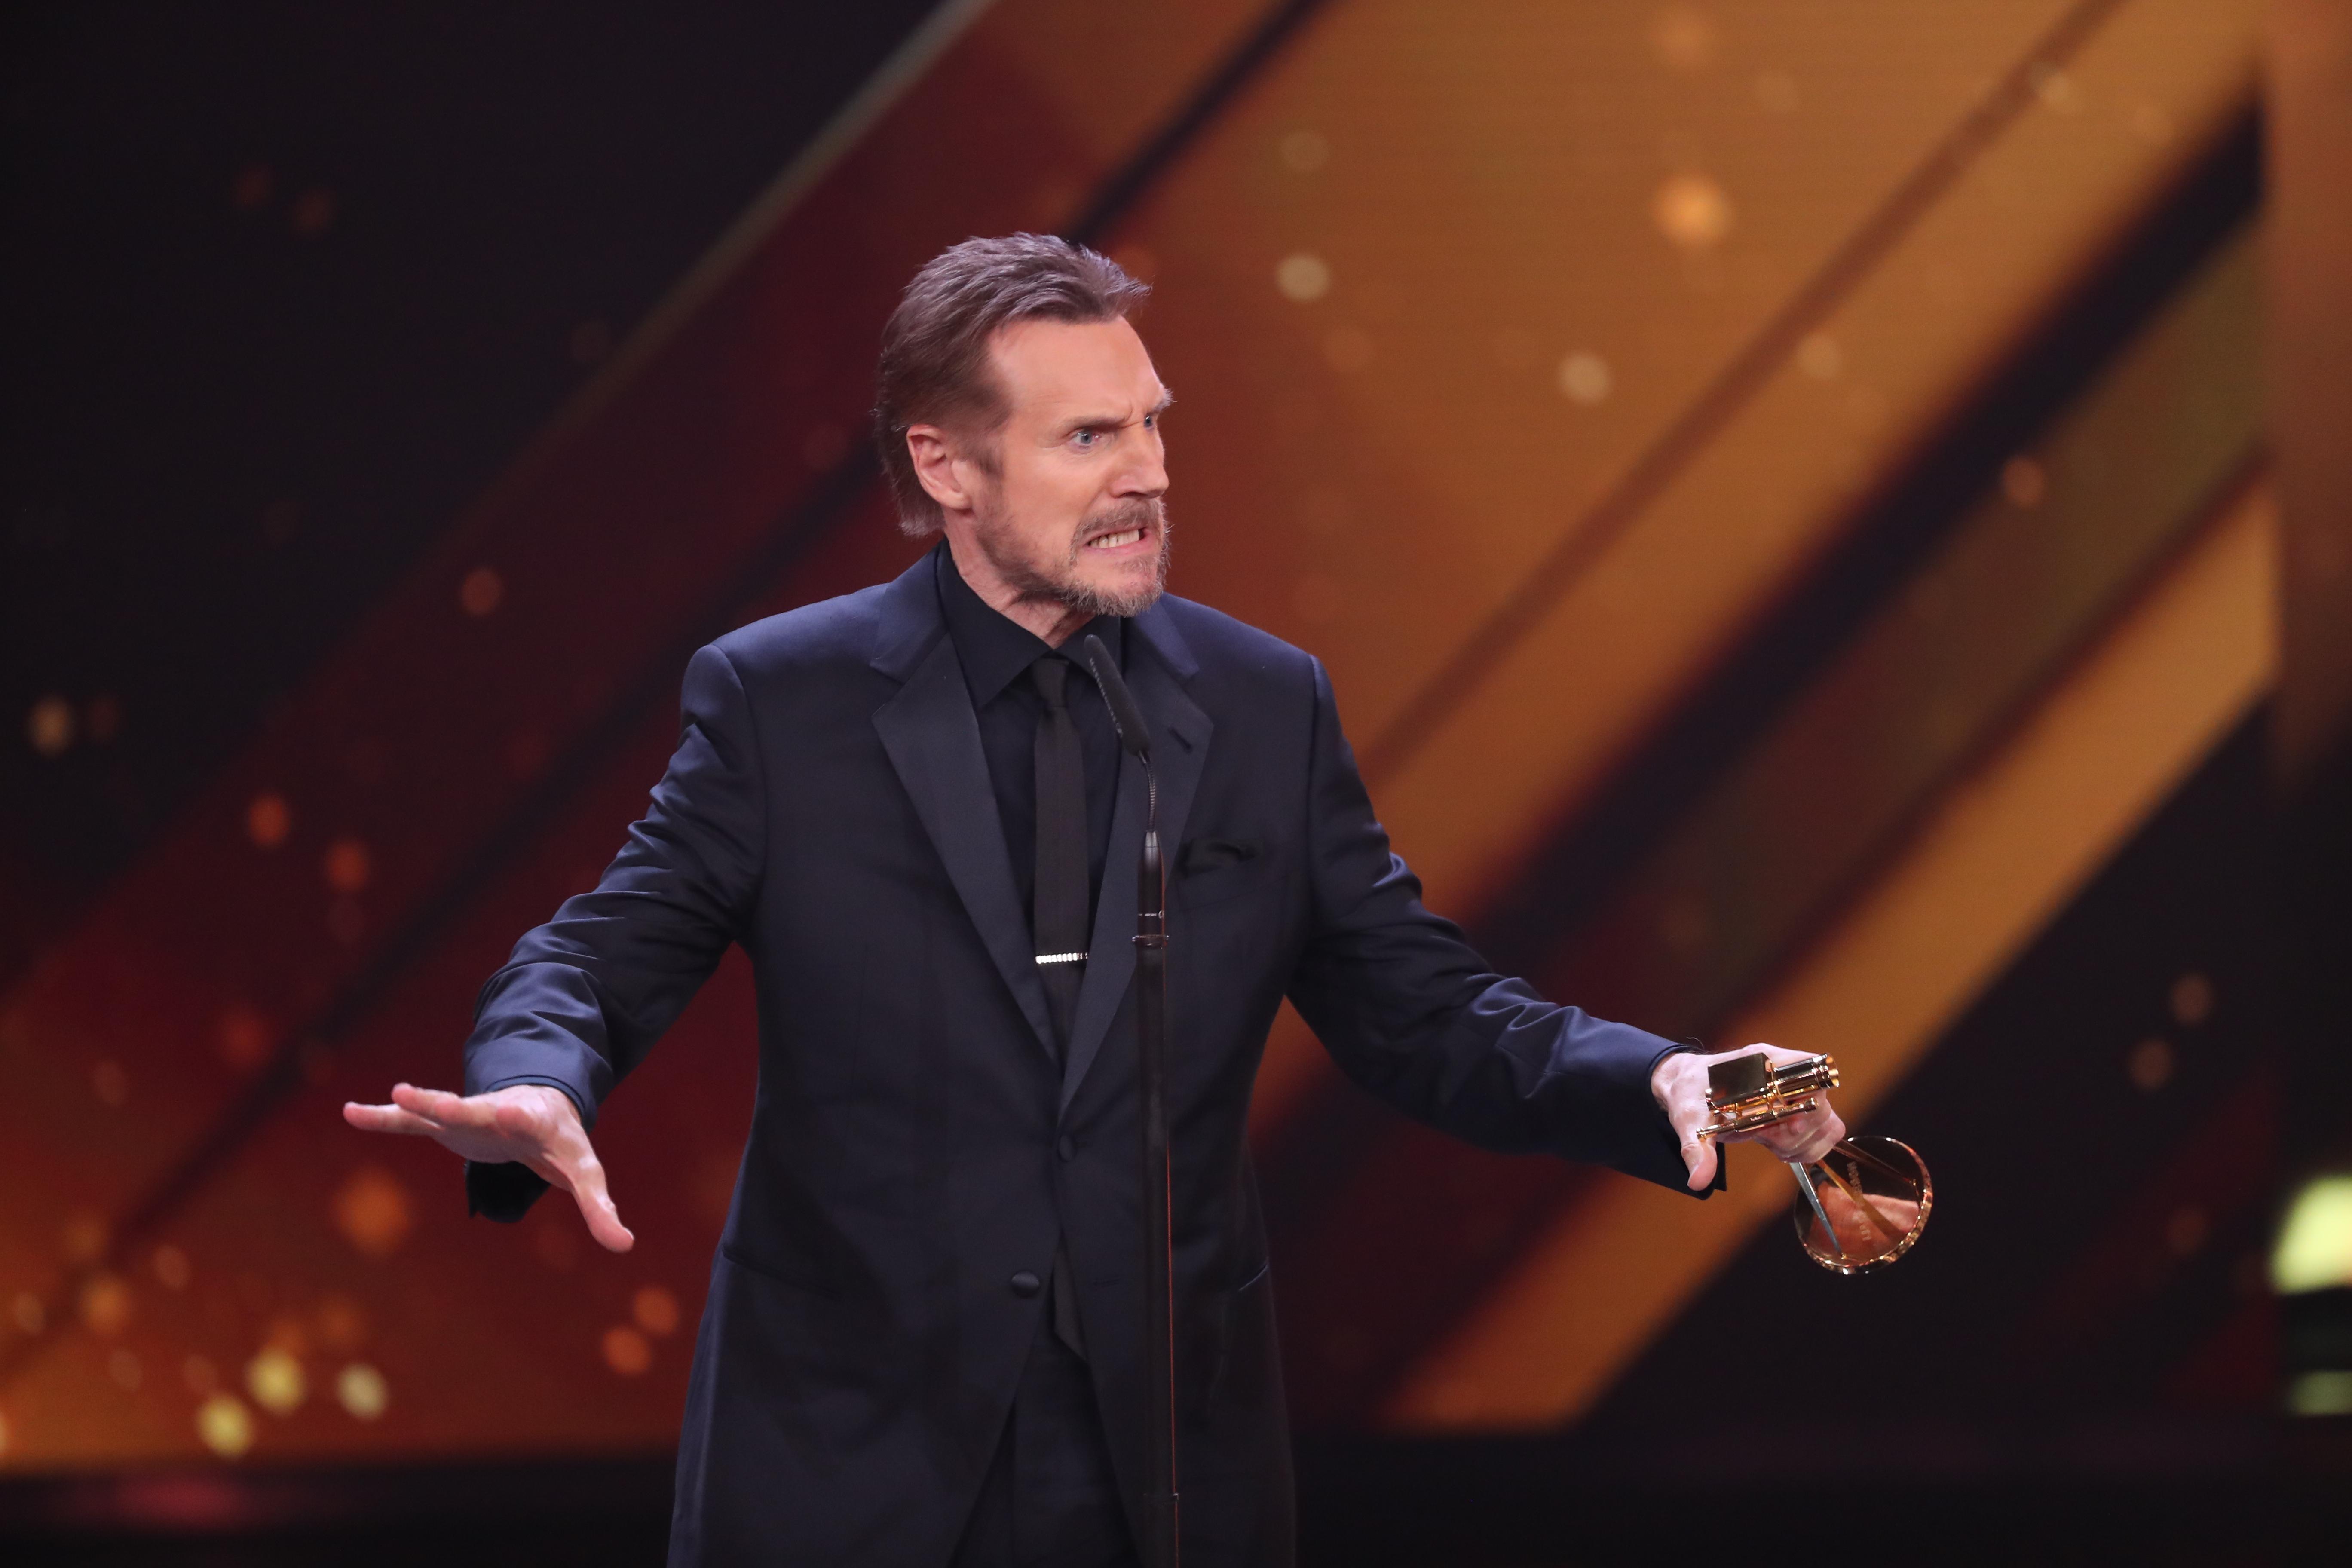 'Accidental' action hero Liam Neeson. Credit: PA